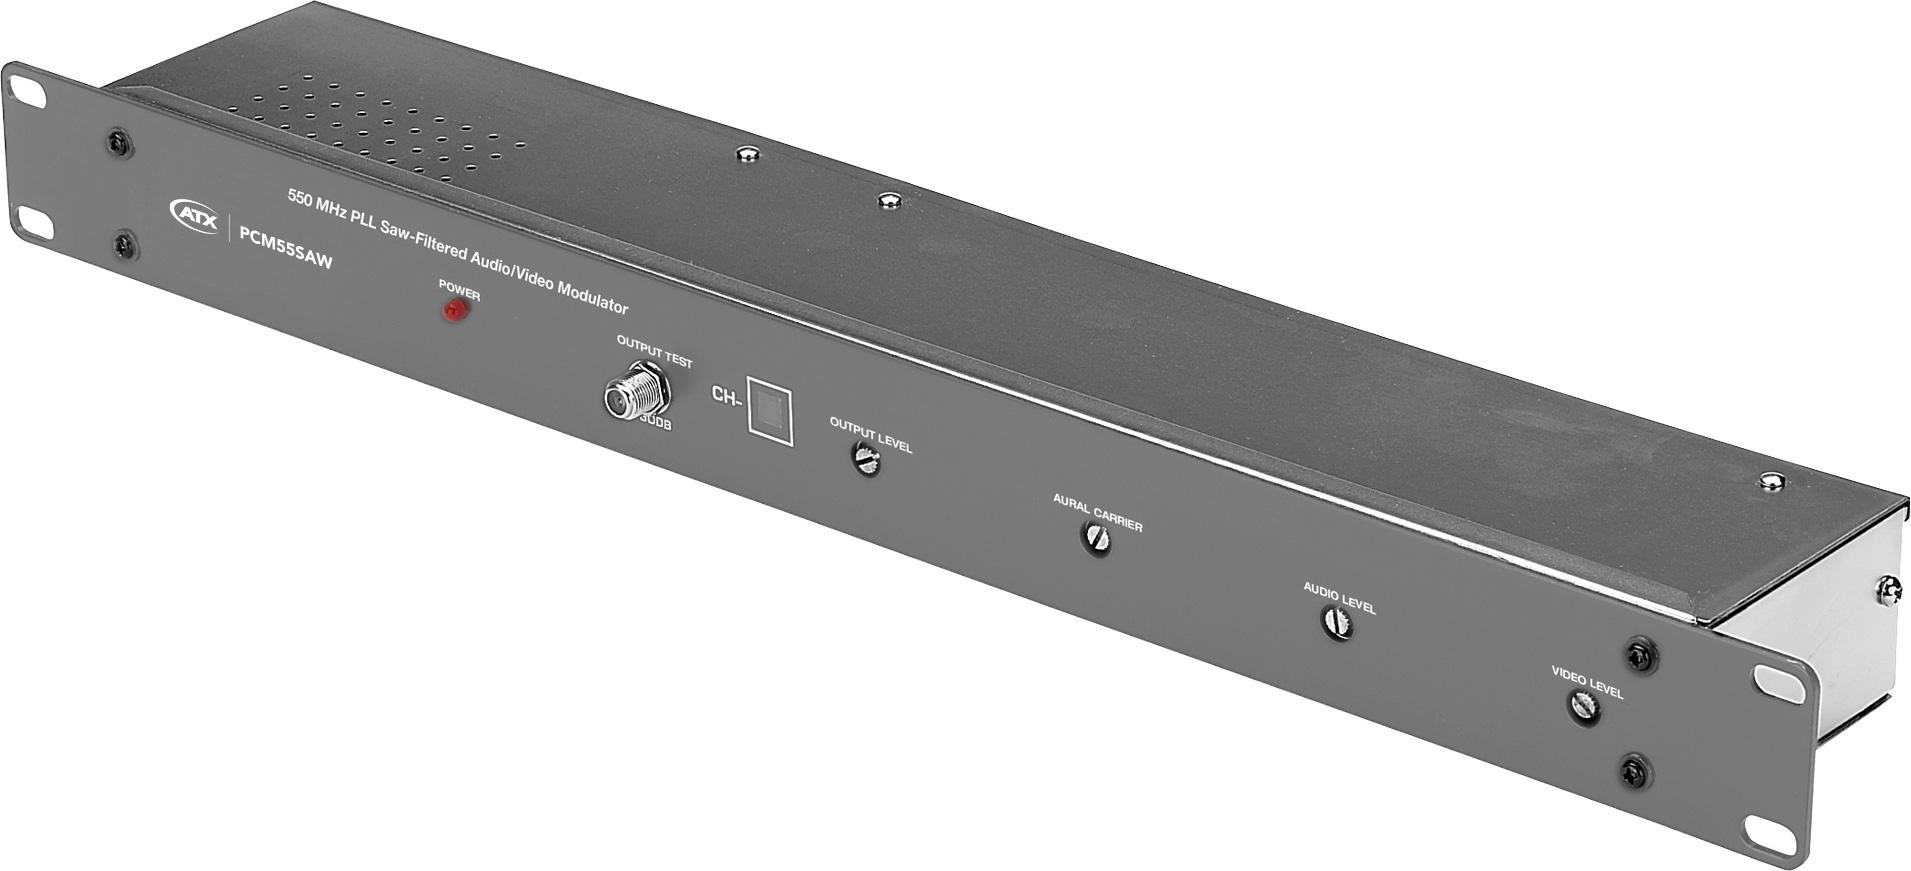 1 Channel Crystal A/V Modulator - Channel C PM-PCM55SAW-C